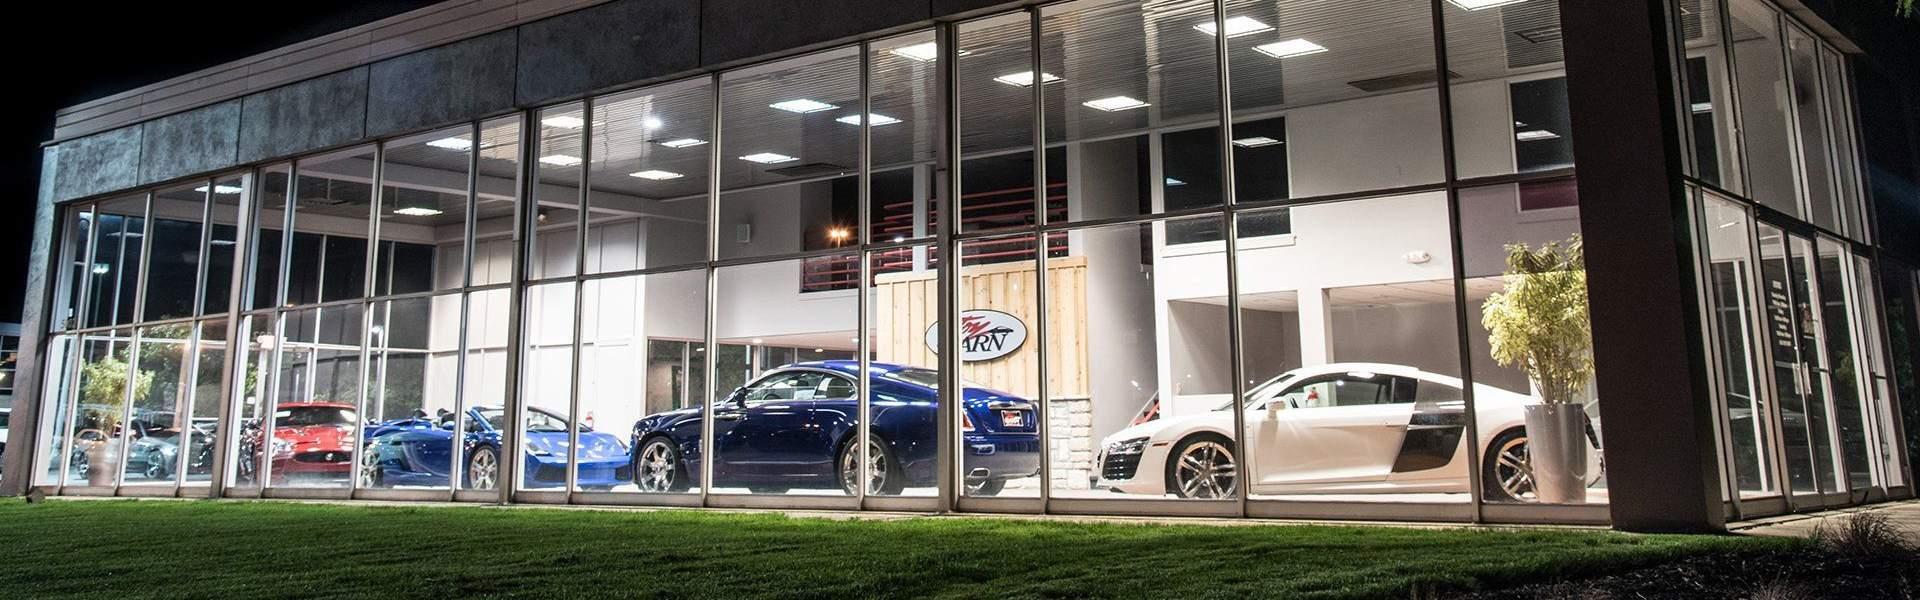 Performance Exotic Luxury Used Car Dealership In Columbus